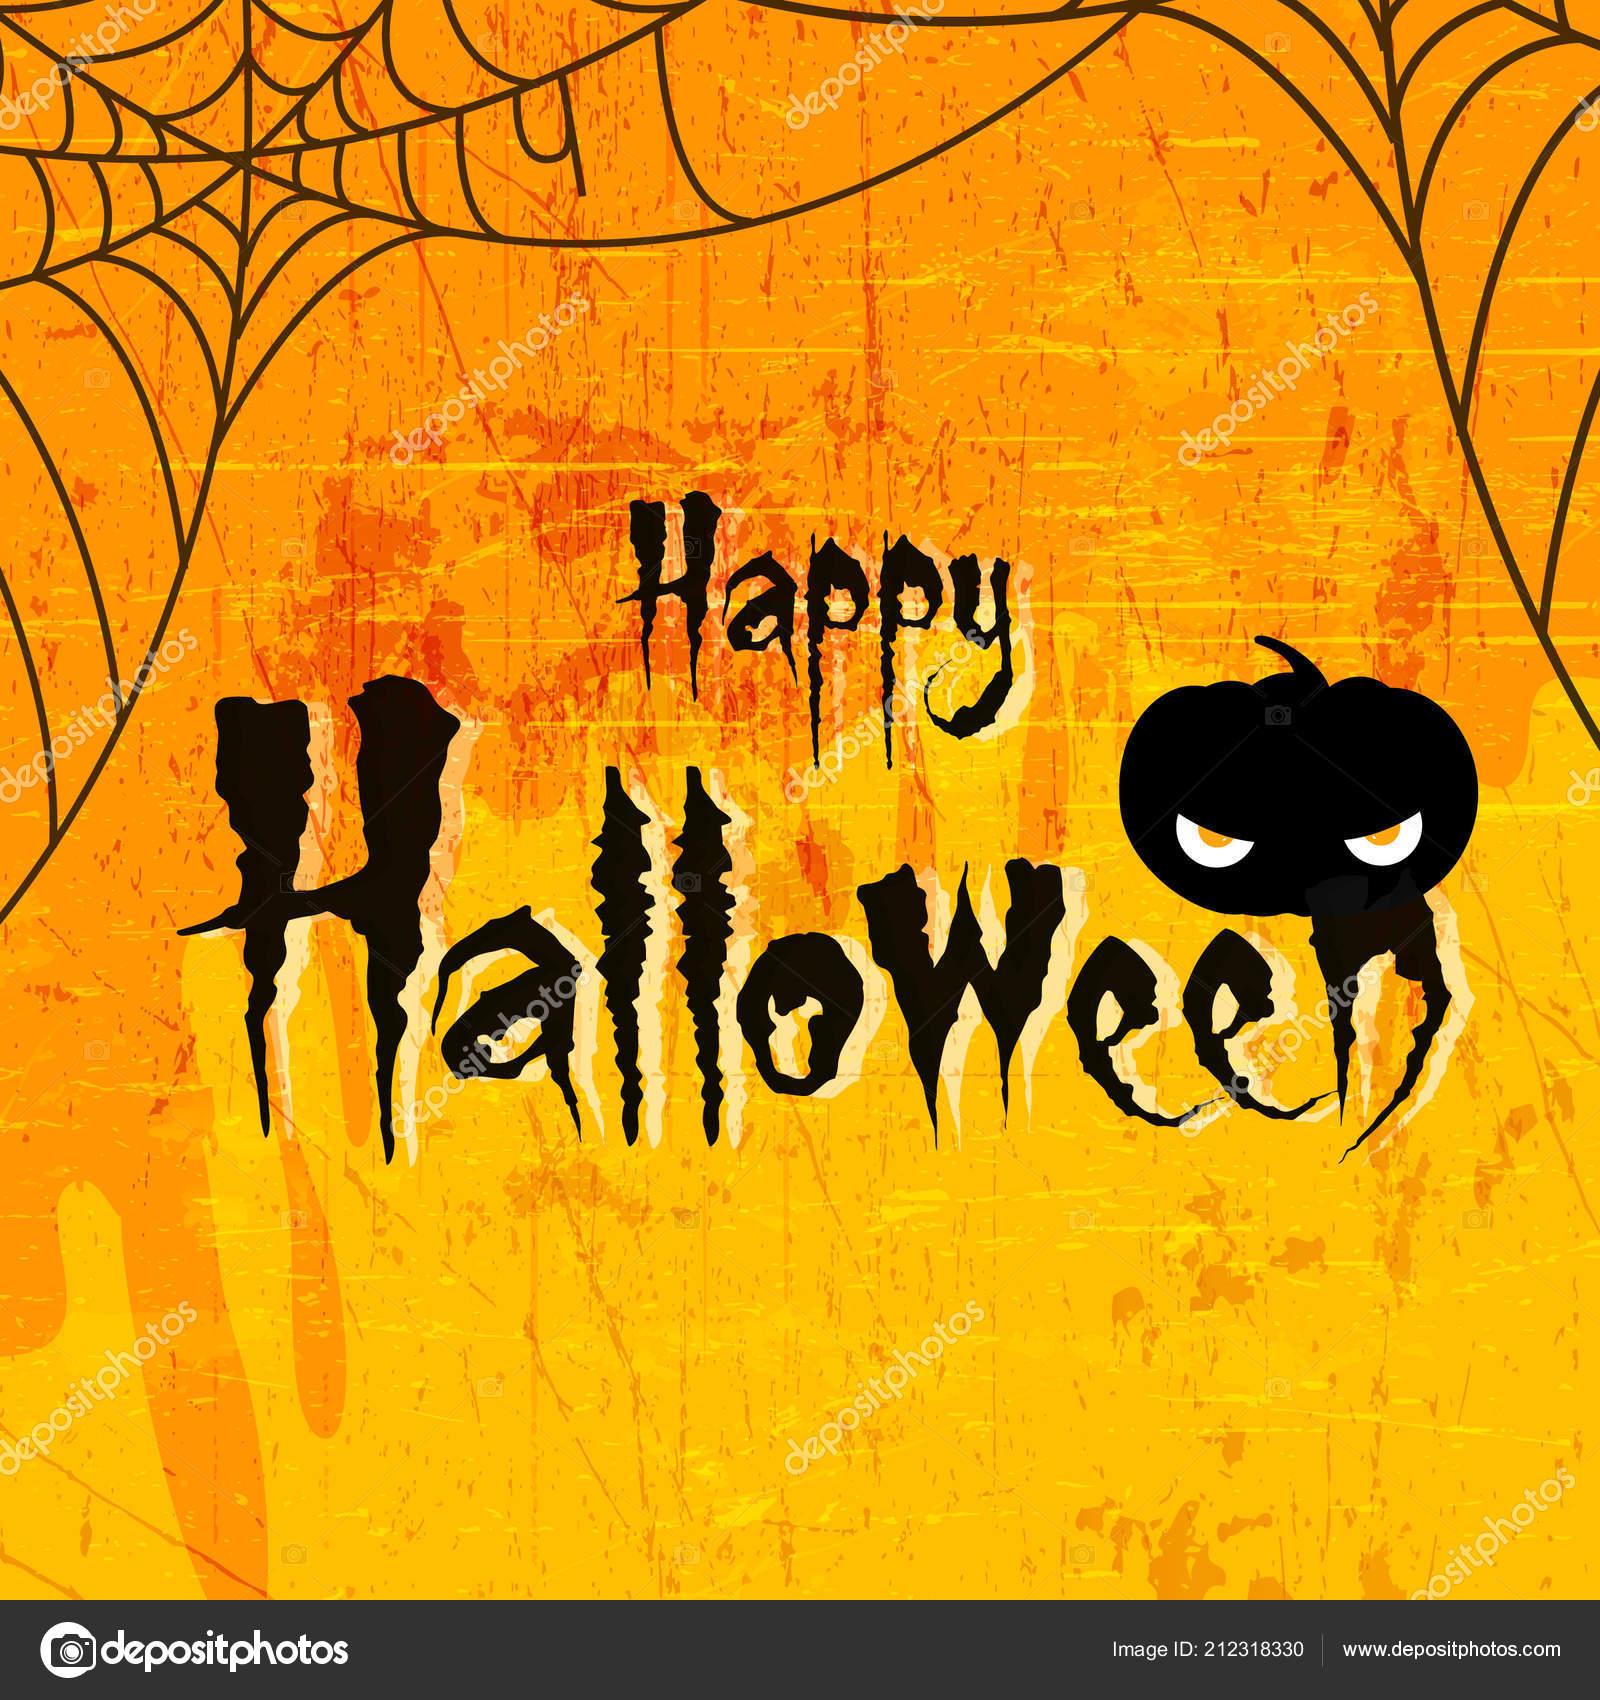 Scary Text Happy Halloween Scary Retro Background Celebration Halloween Stock Vector C Nekiart 212318330